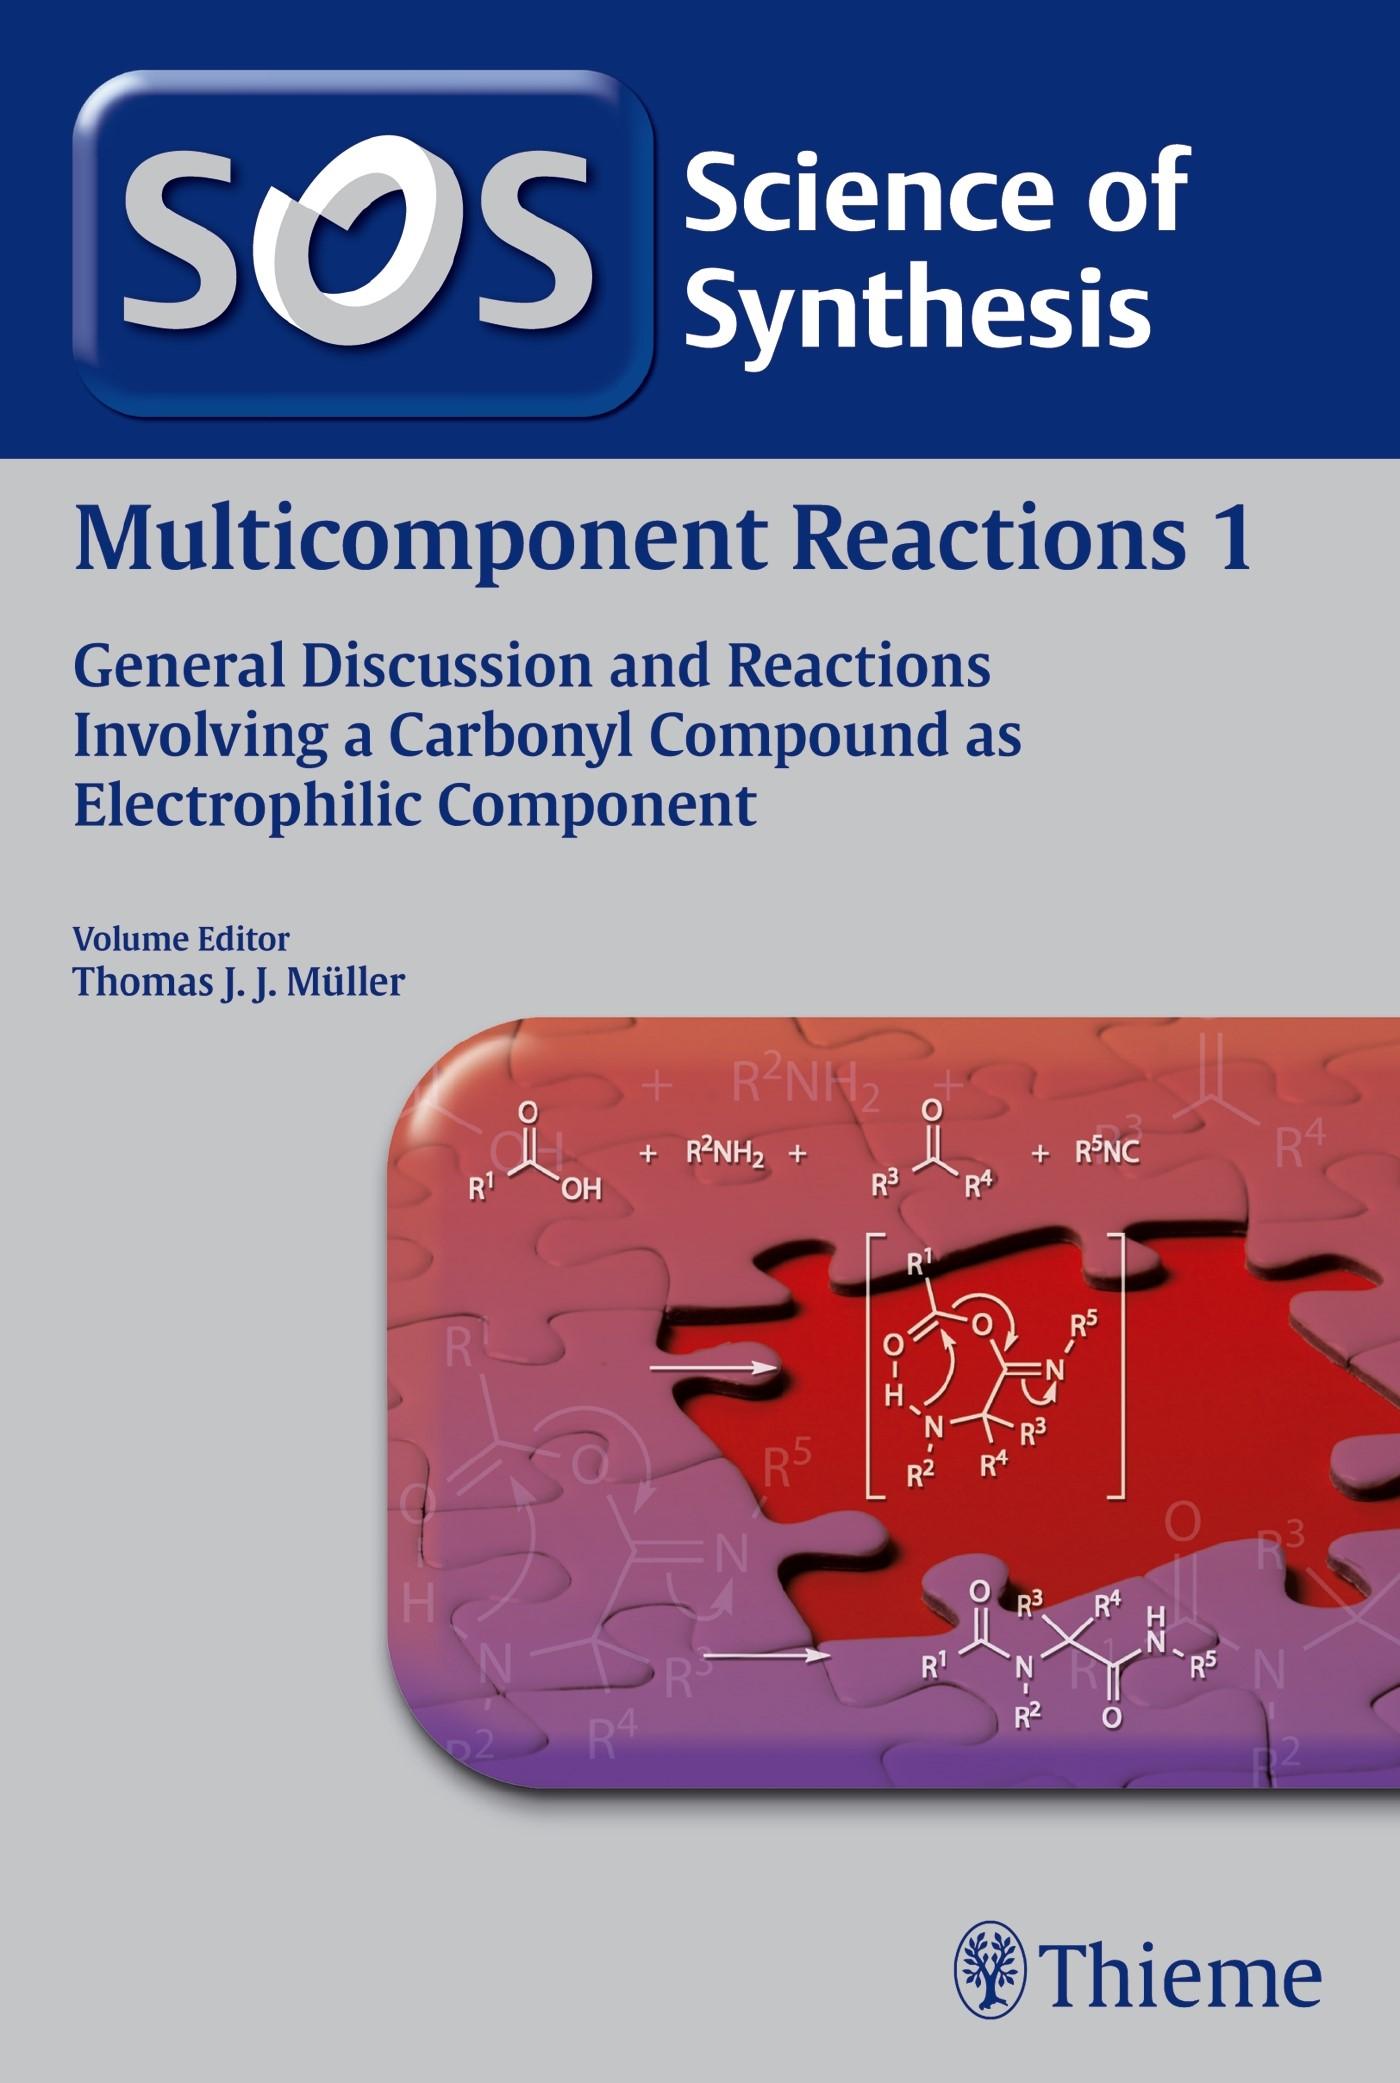 Abbildung von Müller | Science of Synthesis: Multicomponent Reactions Vol. 1 | 1. Auflage | 2014